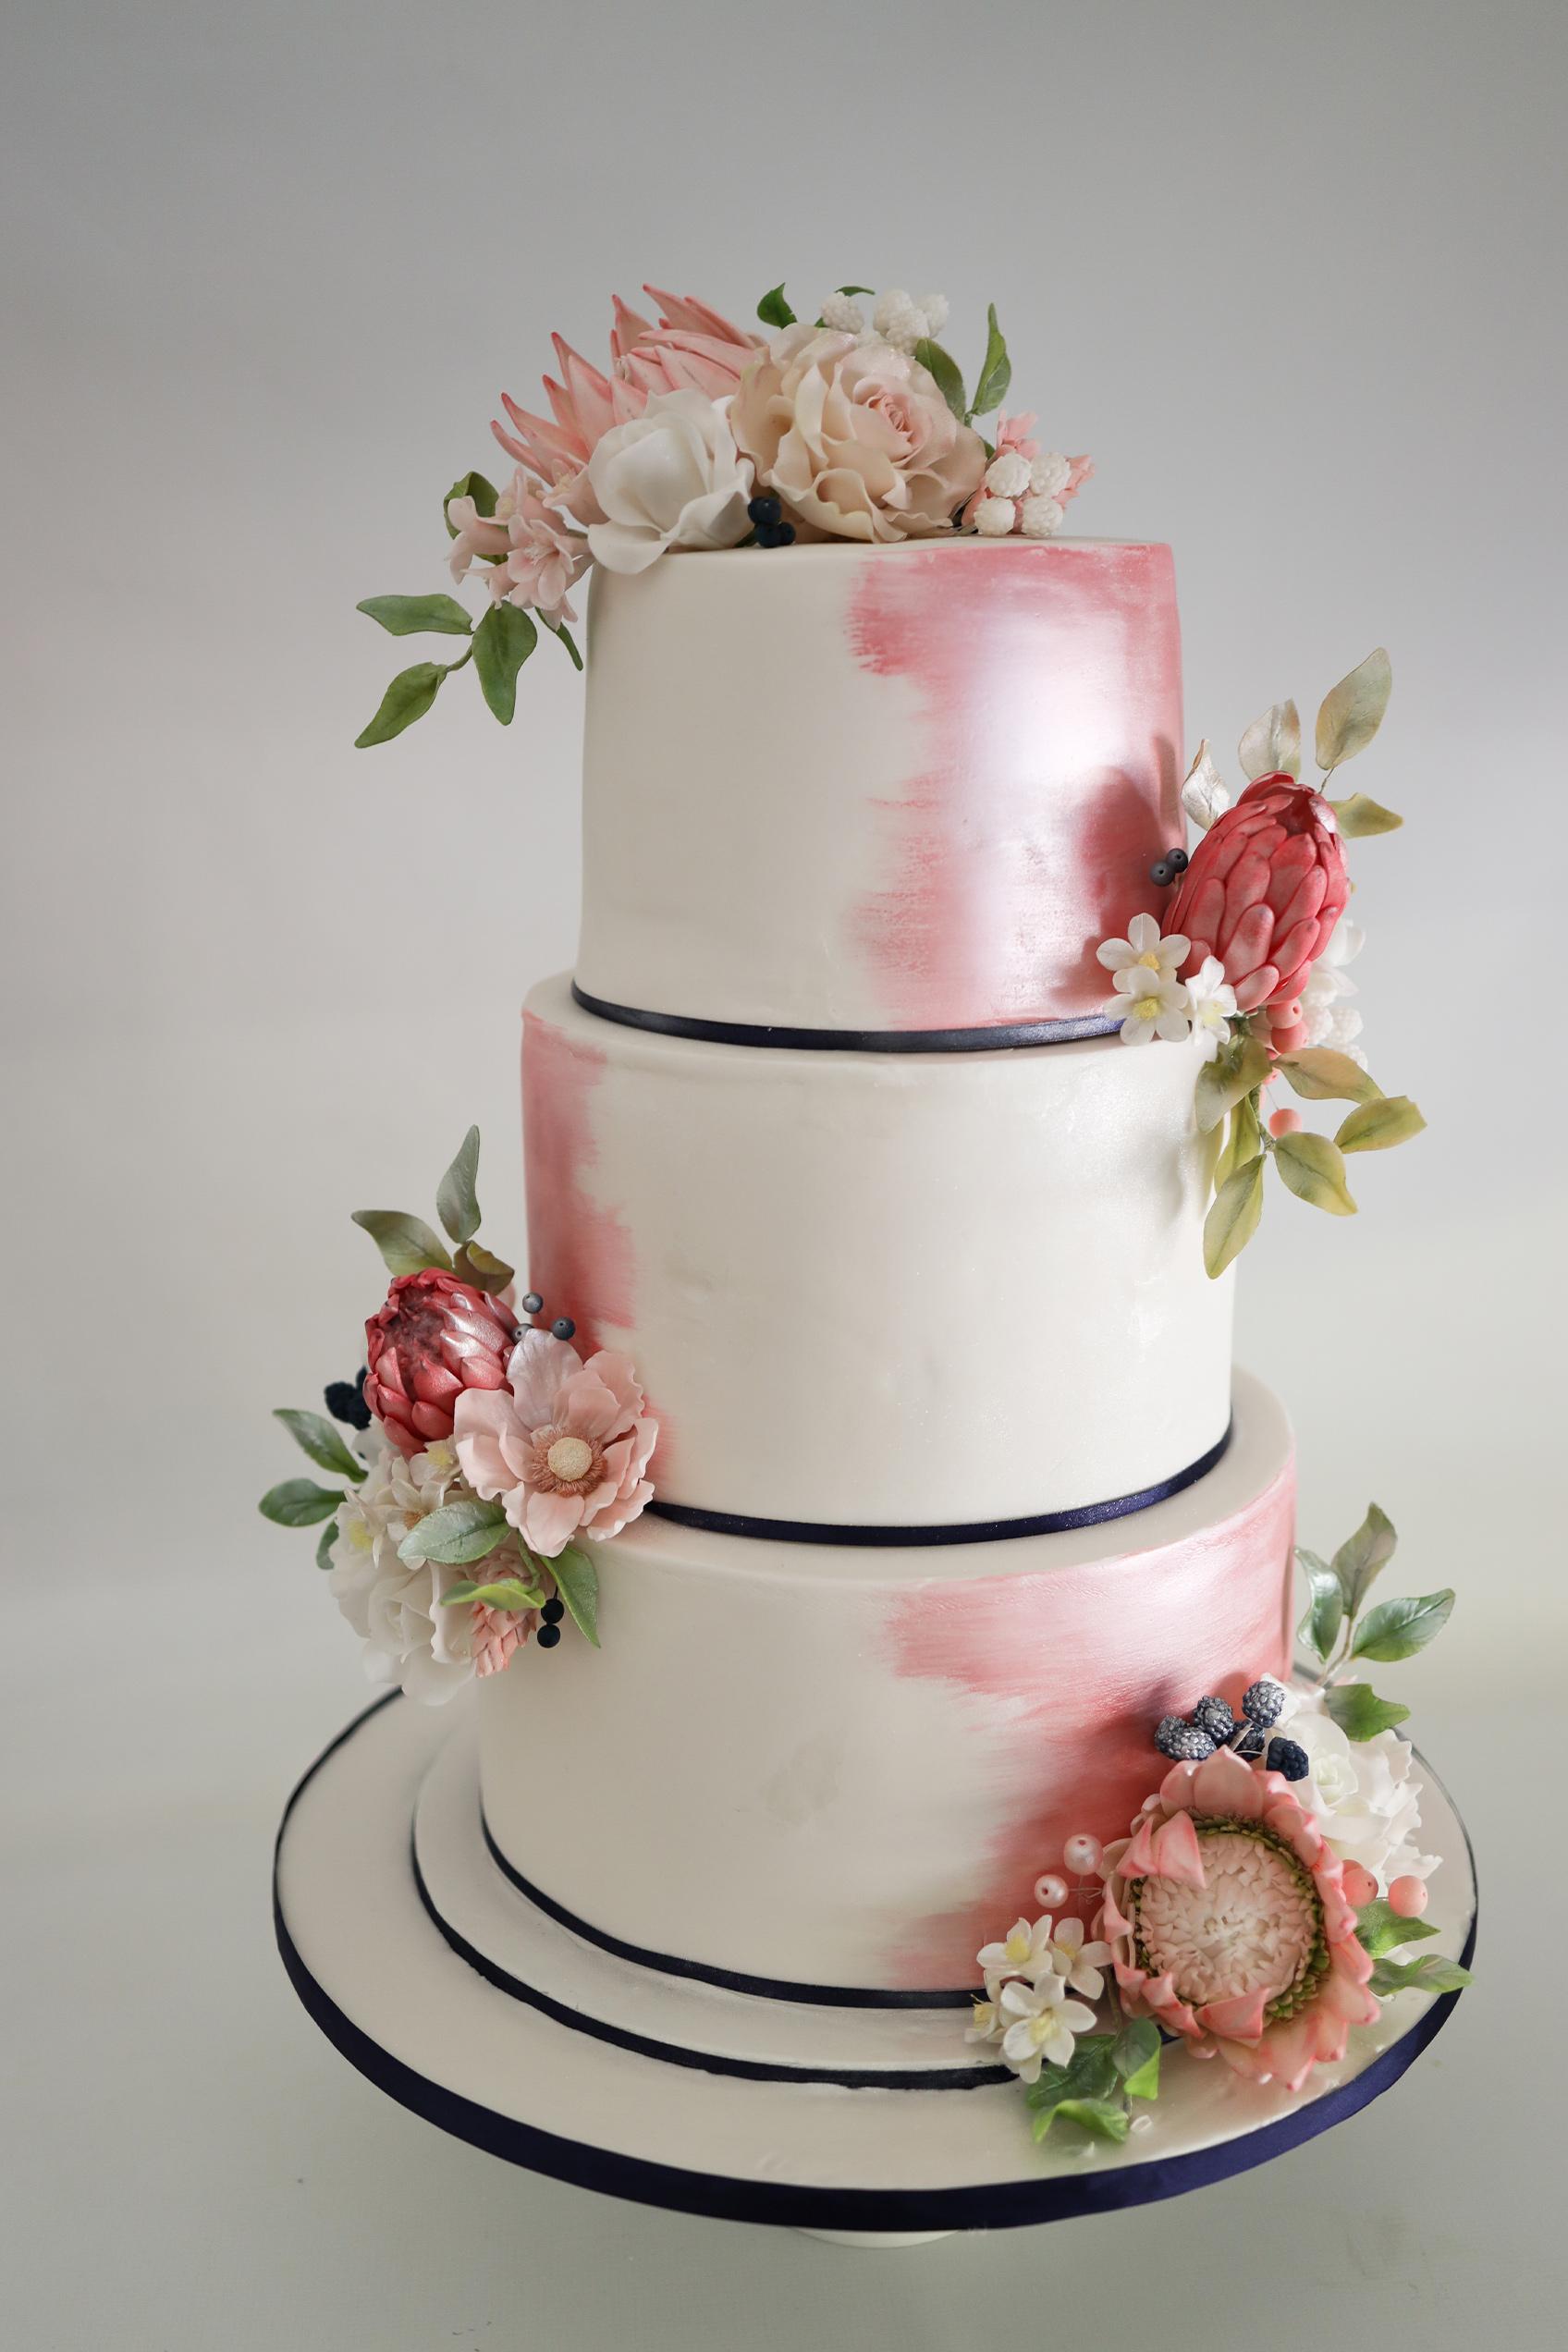 Kelly Jayne's Cake Boutique - Cakes & Desserts Randburg